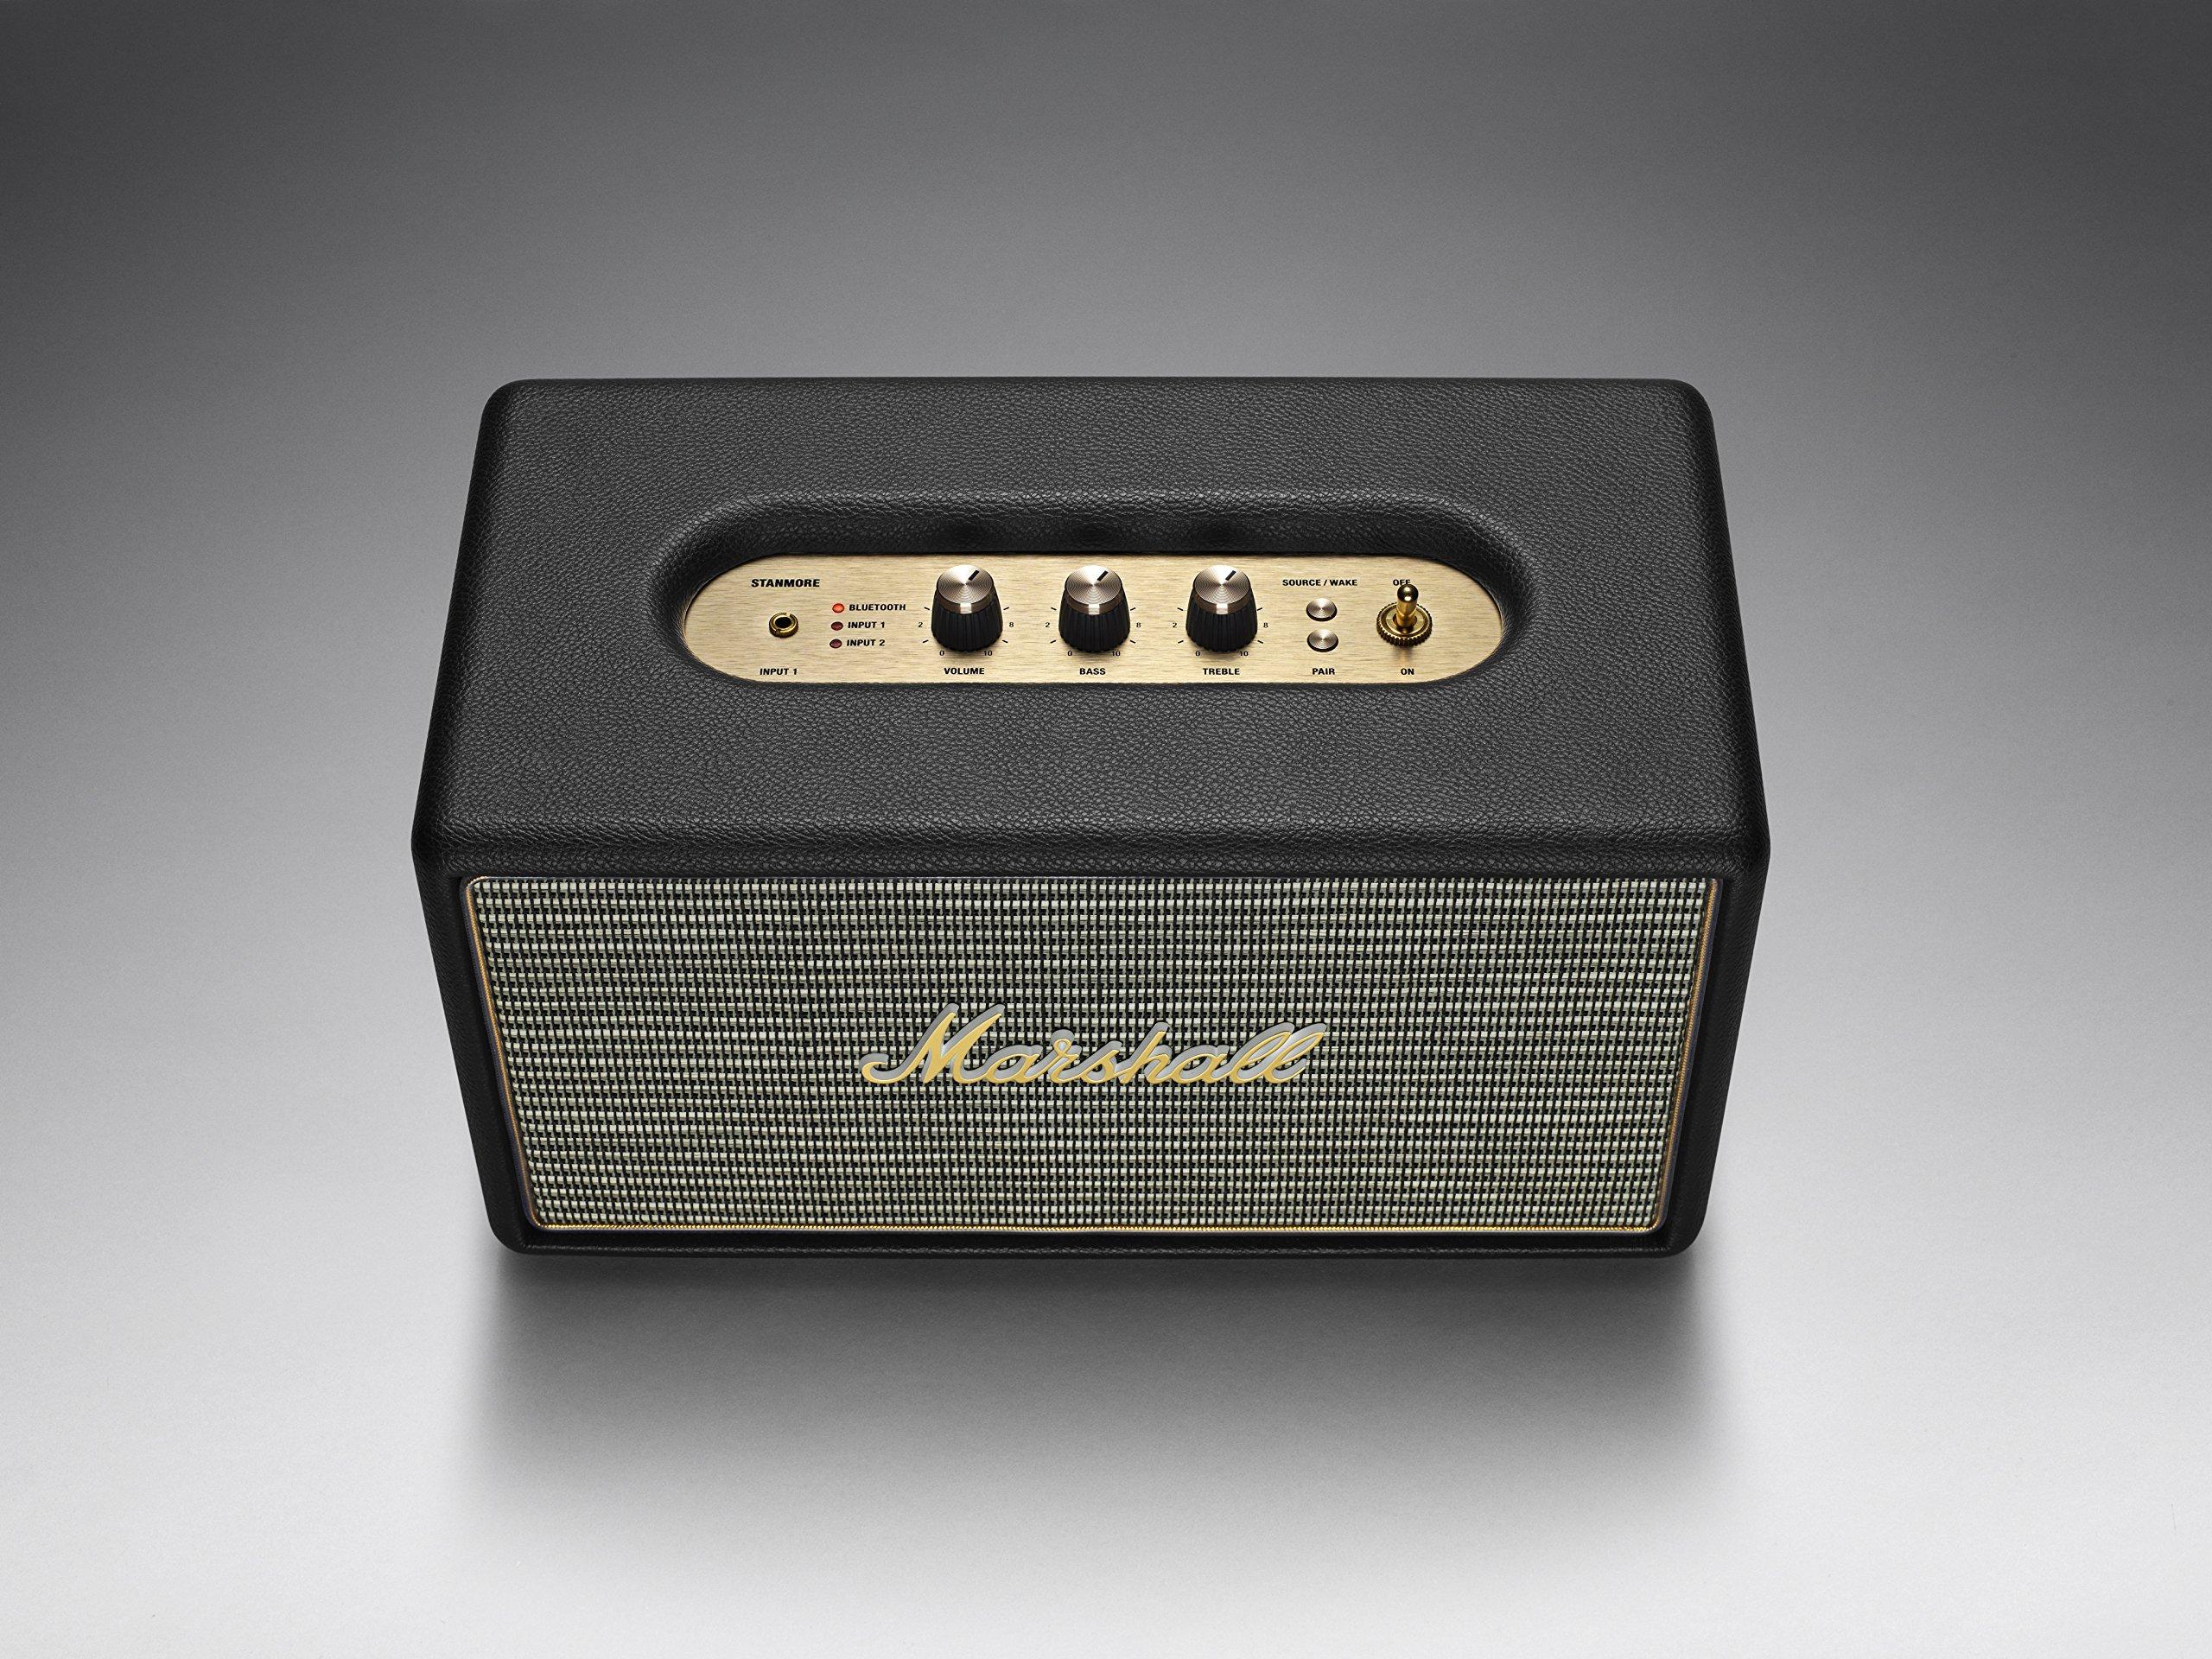 Marshall Stanmore Bluetooth Speaker, Black (04091627) by Marshall (Image #1)